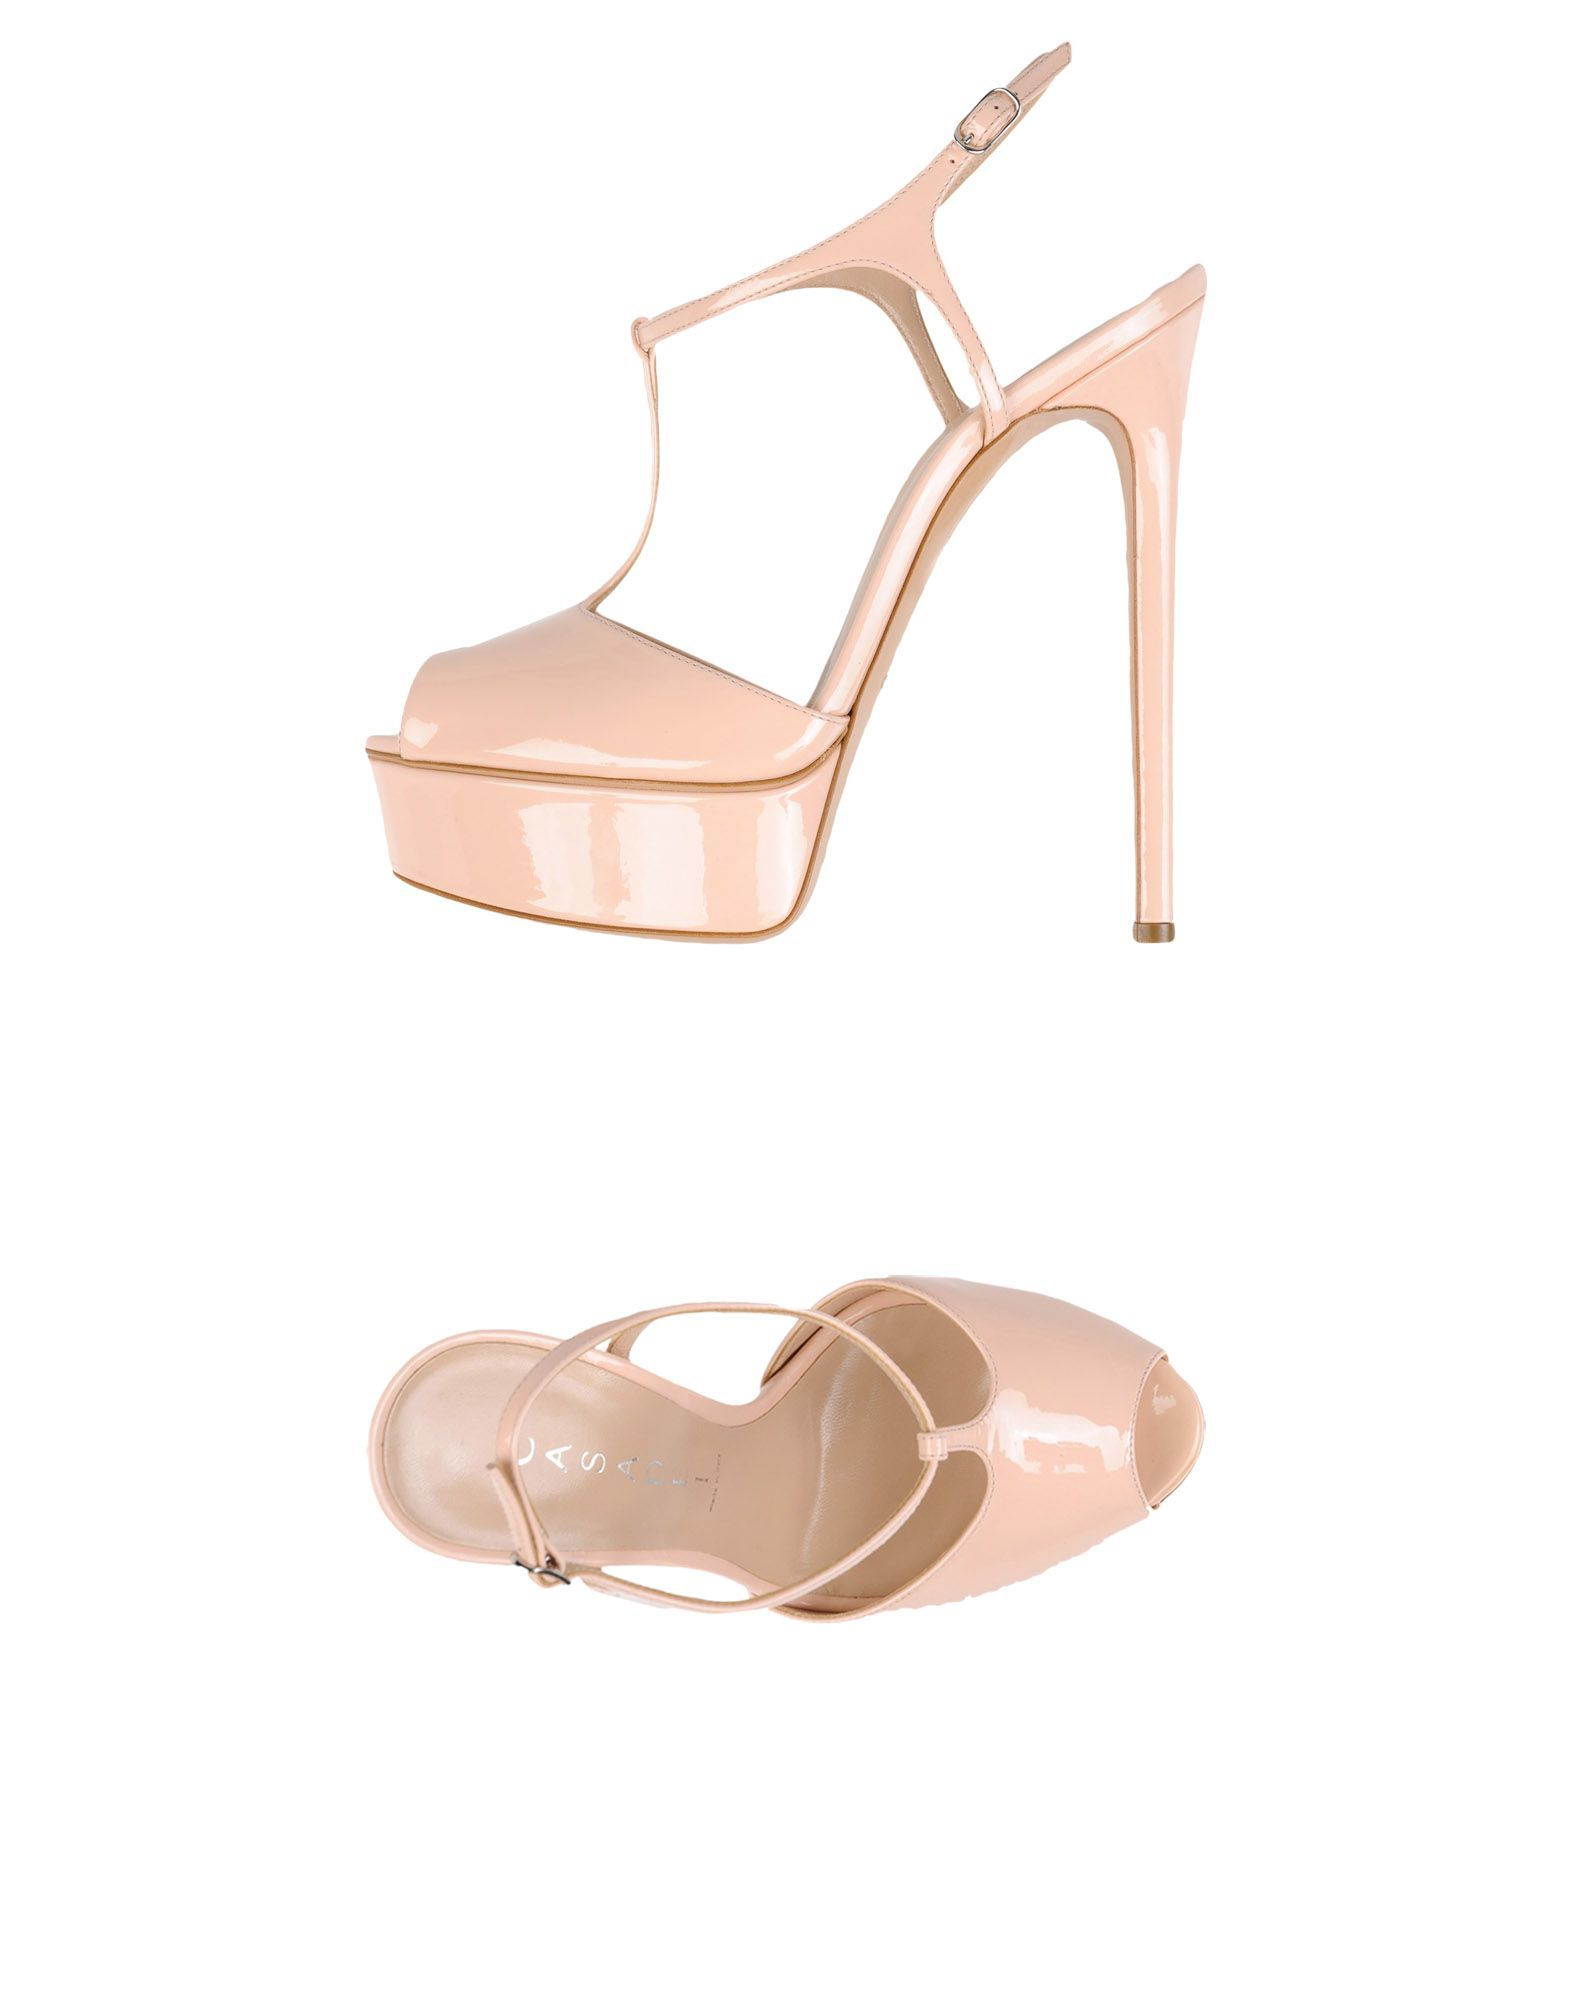 FOOTWEAR - Toe strap sandals on YOOX.COM Casadei yhiGtIRc